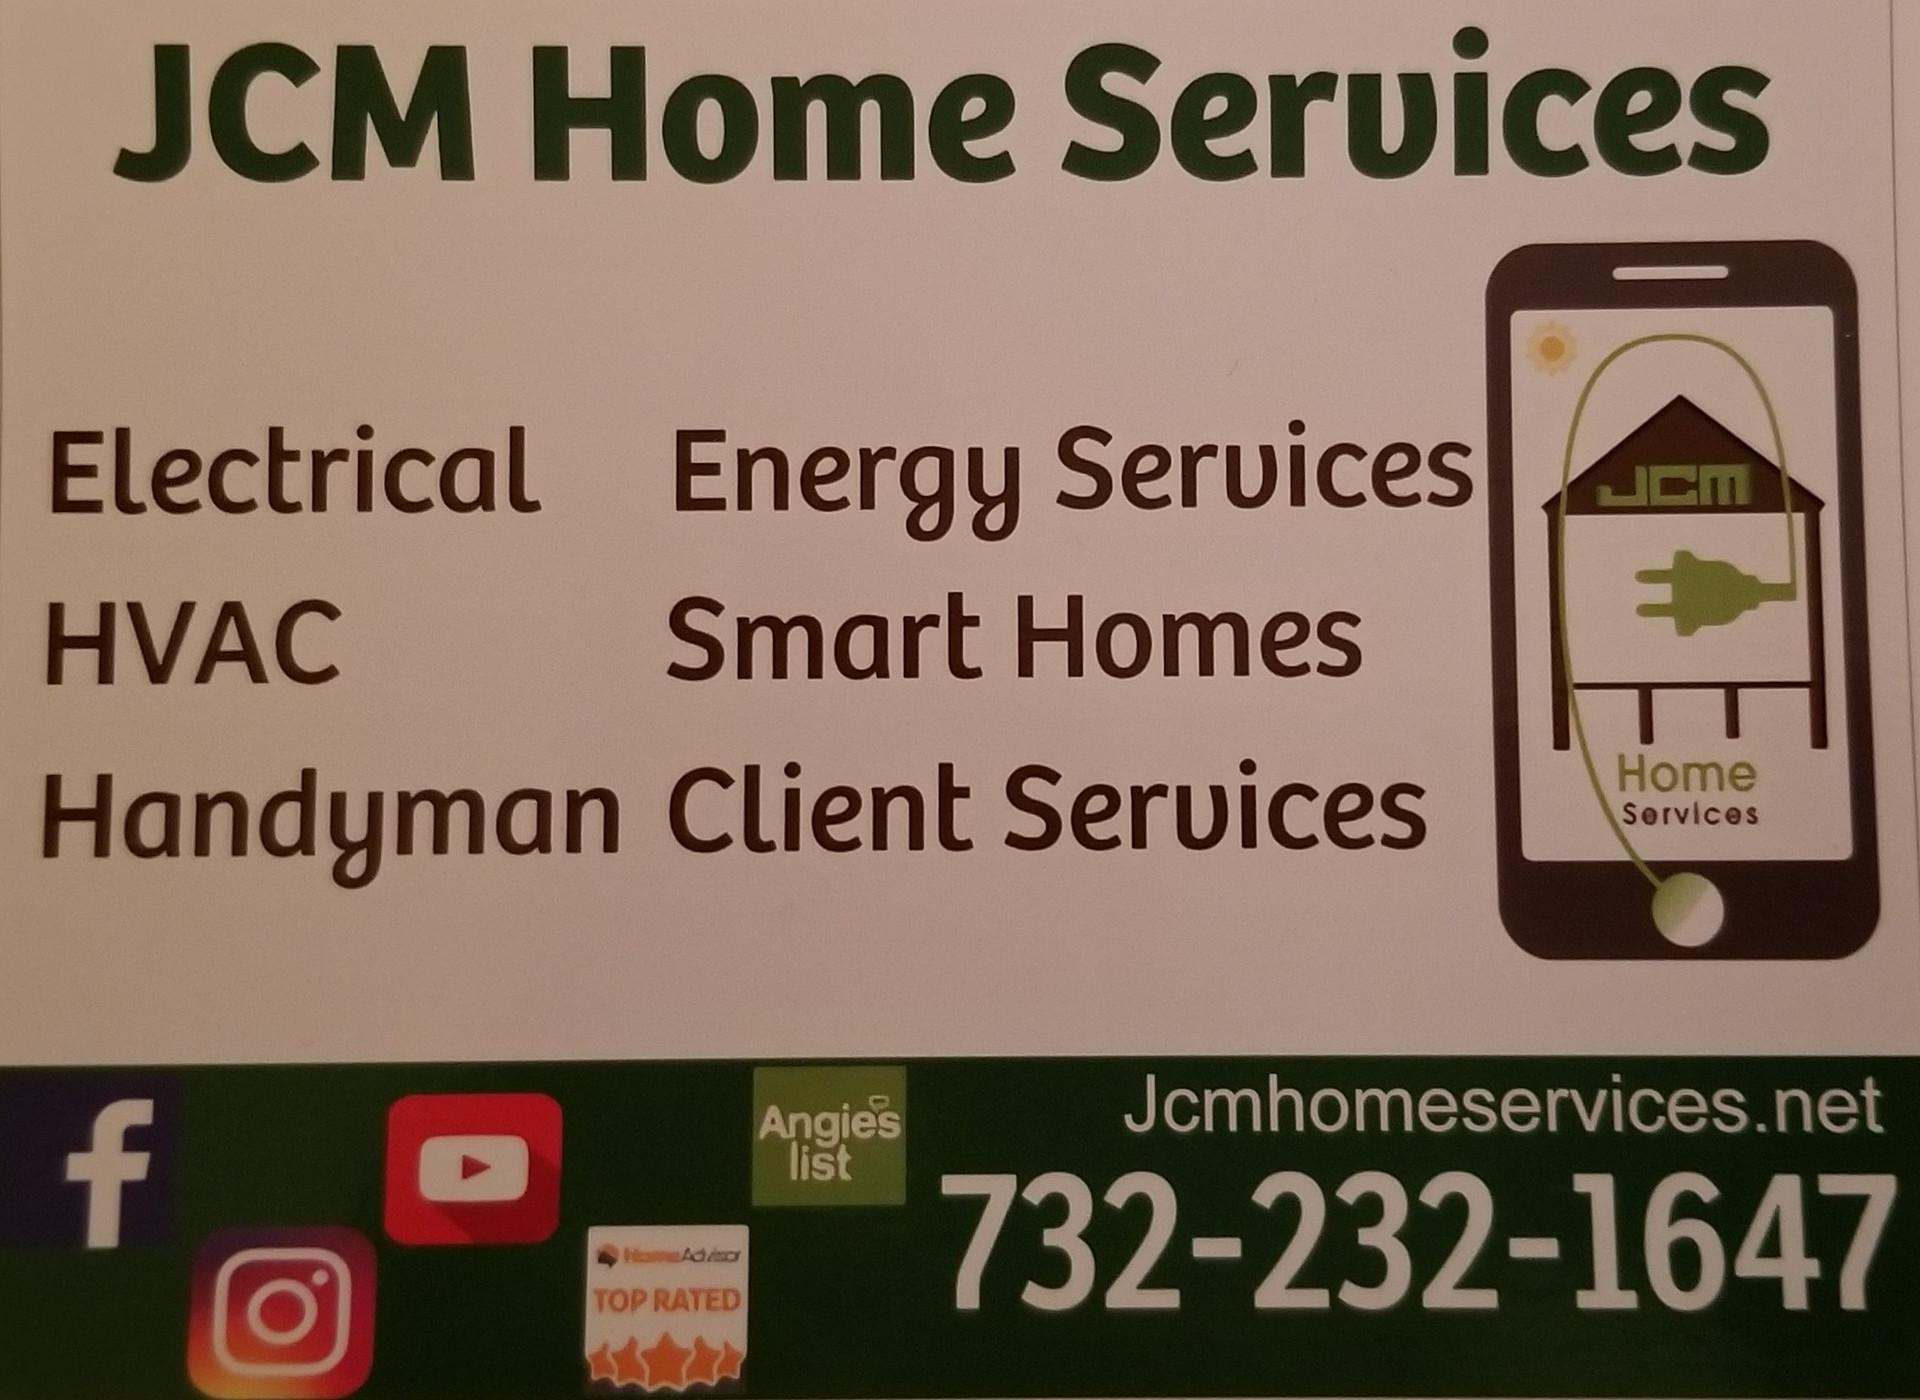 JCM Home Services.jpg